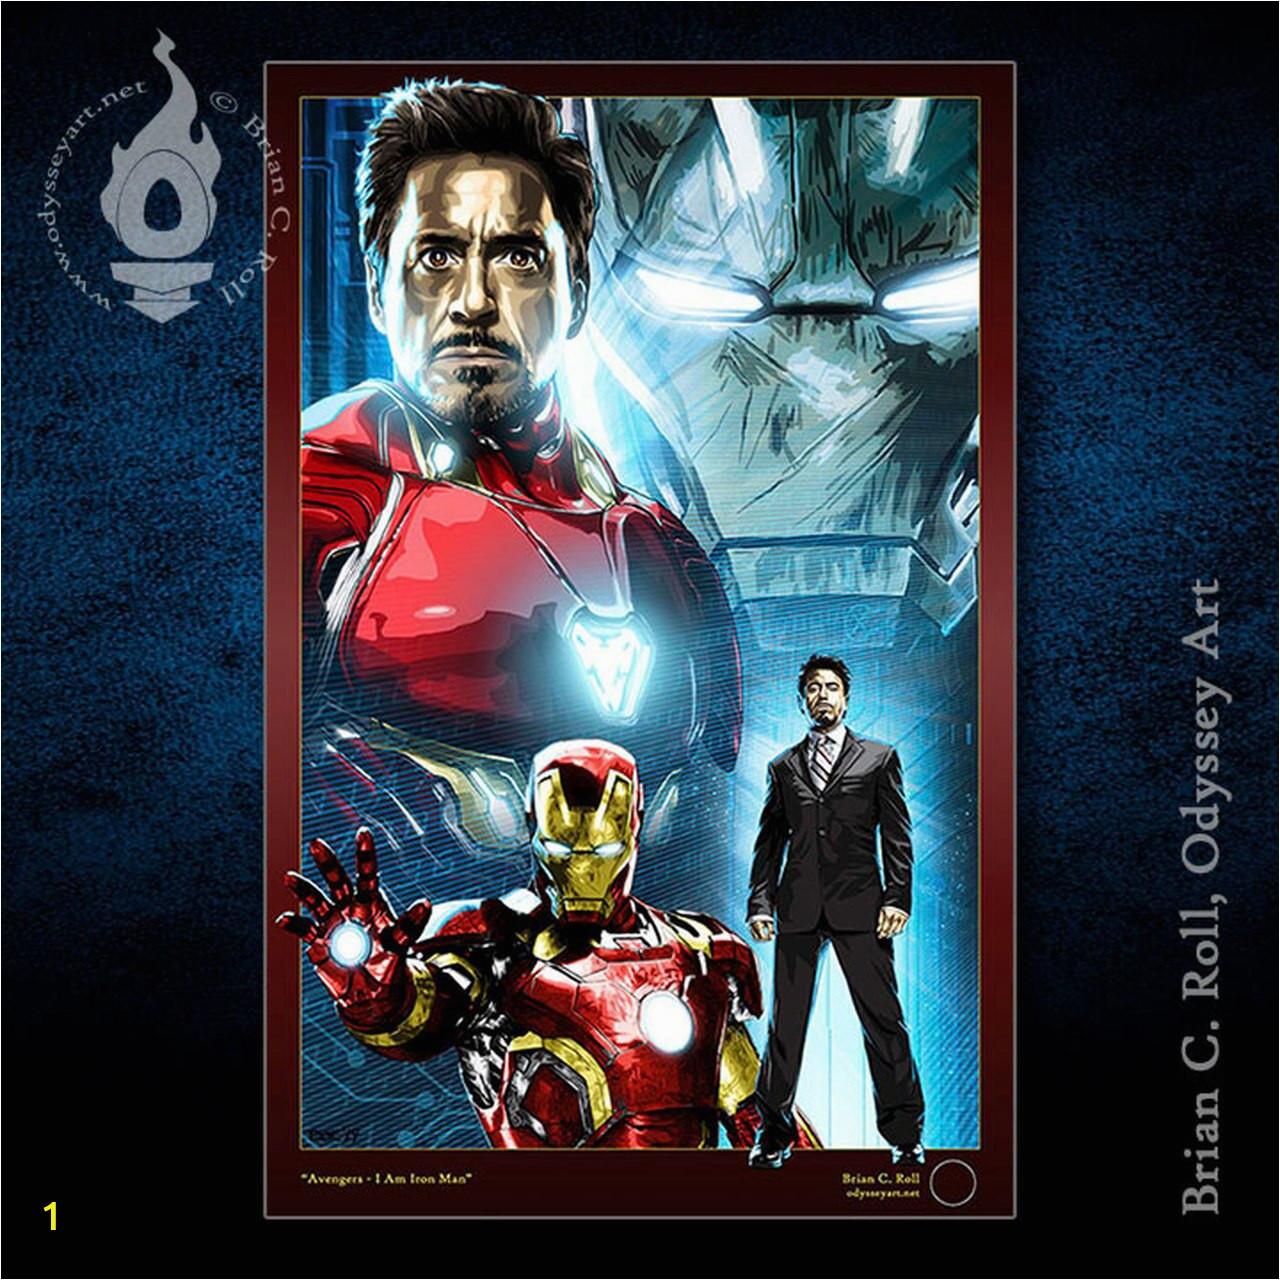 Avengers IAmIronMan 11x17print store